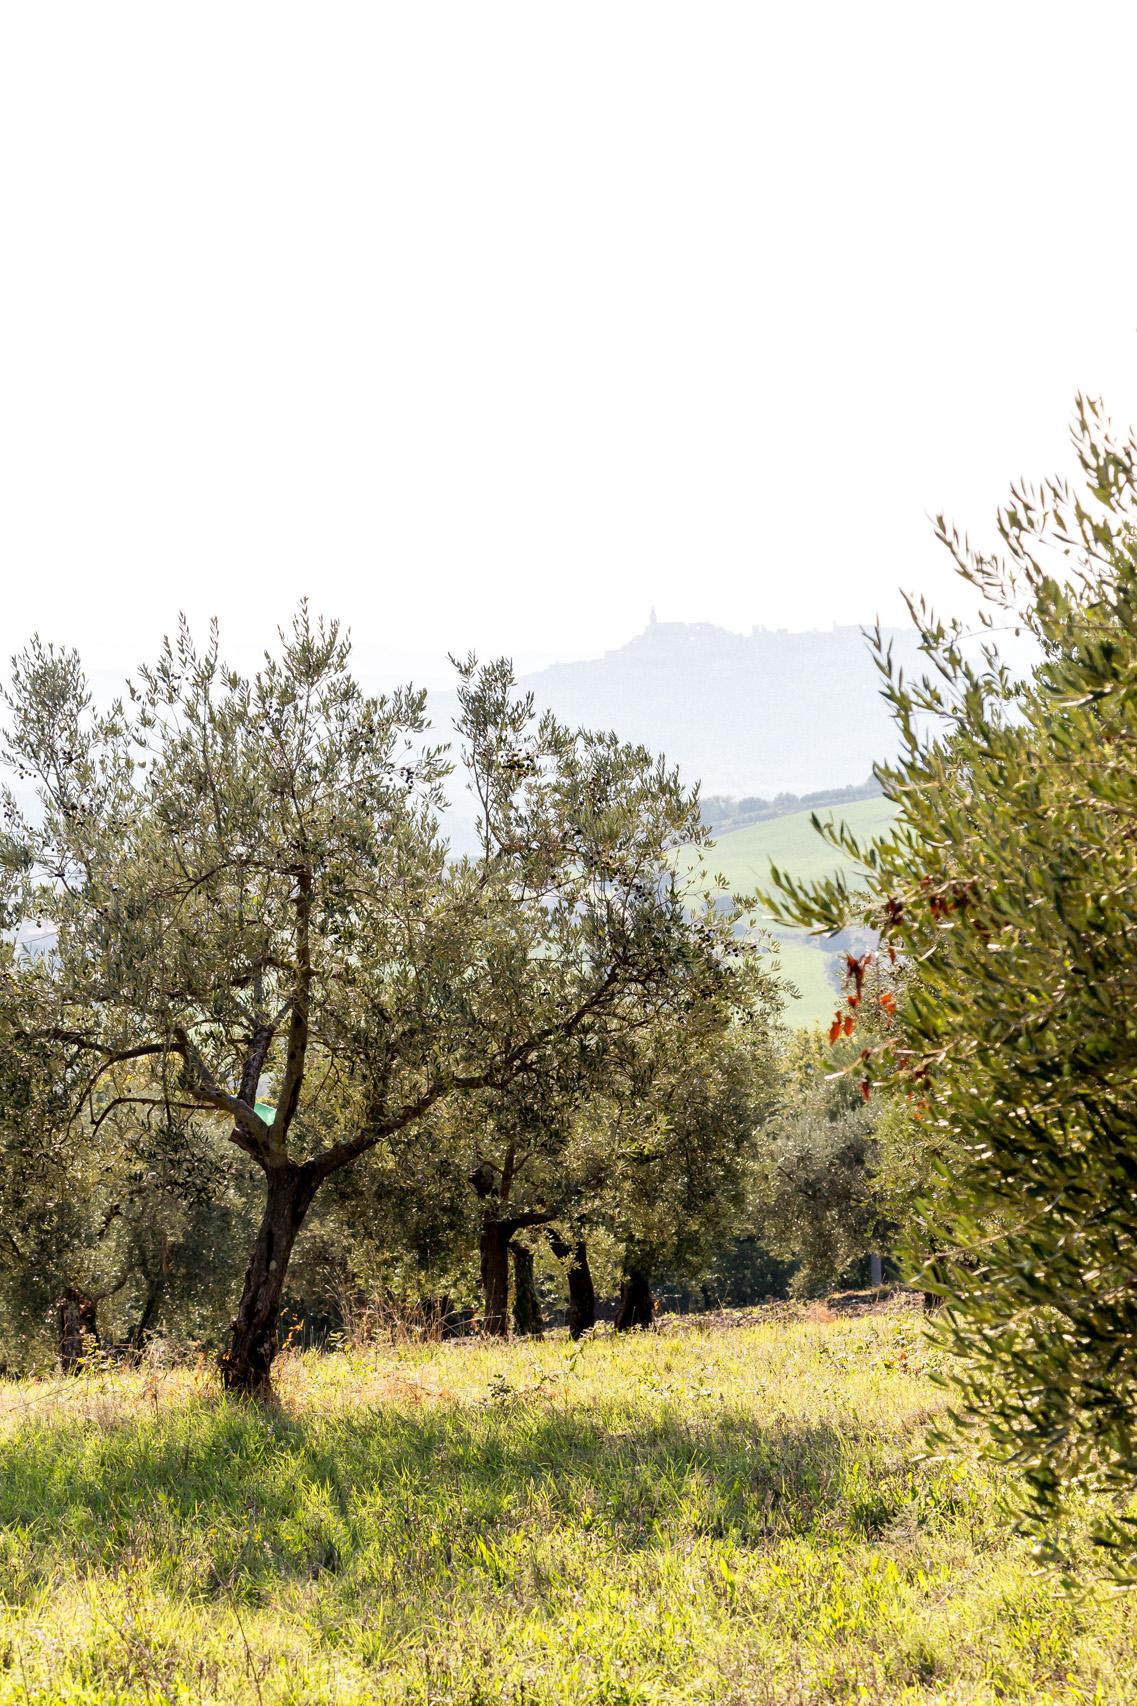 Olive groves around Todi, Umbria